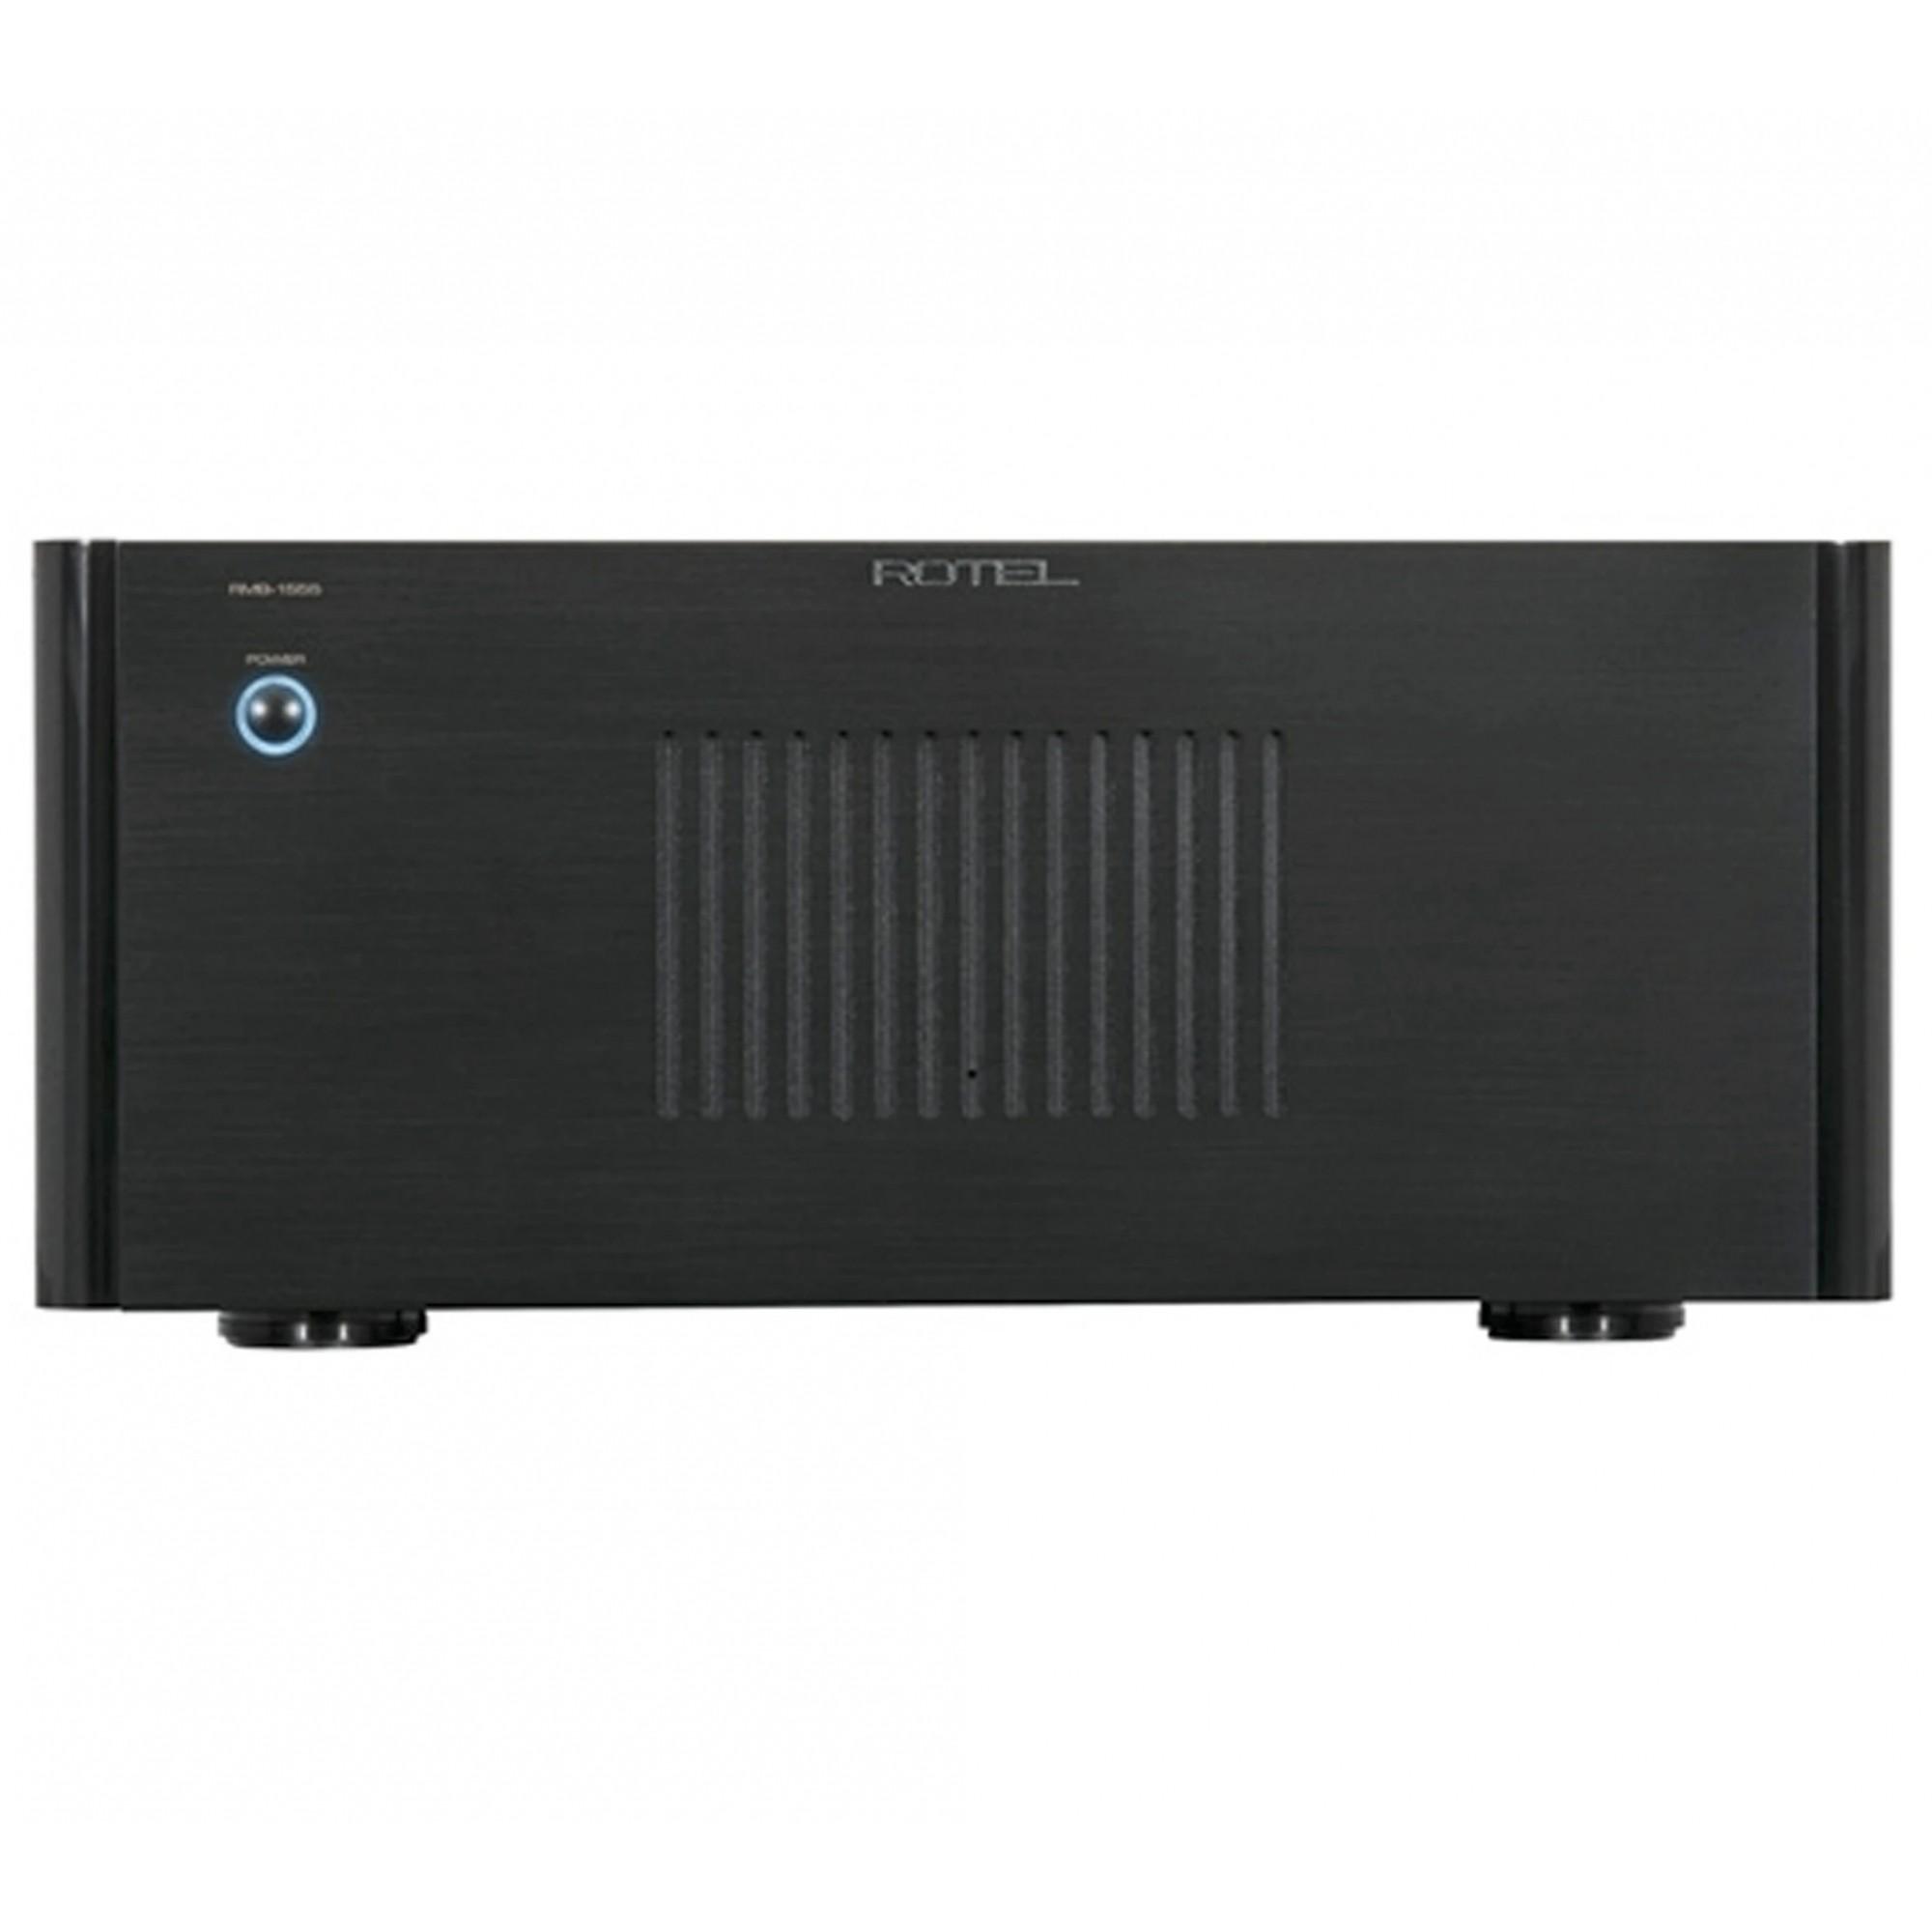 Rotel RMB-1555 Amplificador Home Theater 5 Canais 120W